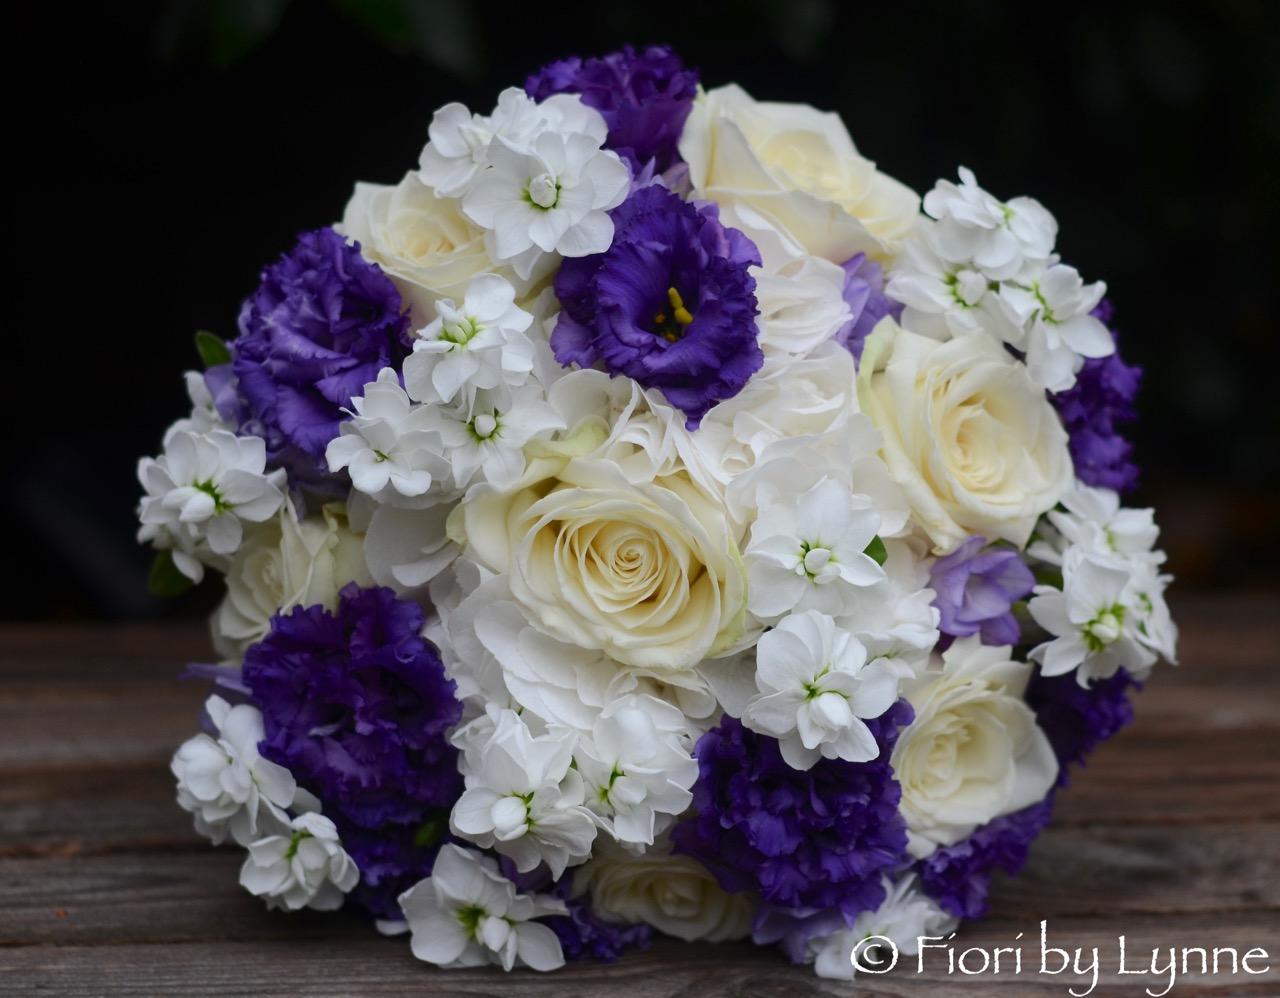 Wedding flowers blog hannah and stuarts classic purple and white hannah and stuarts classic purple and white wedding flowers rhinefield house izmirmasajfo